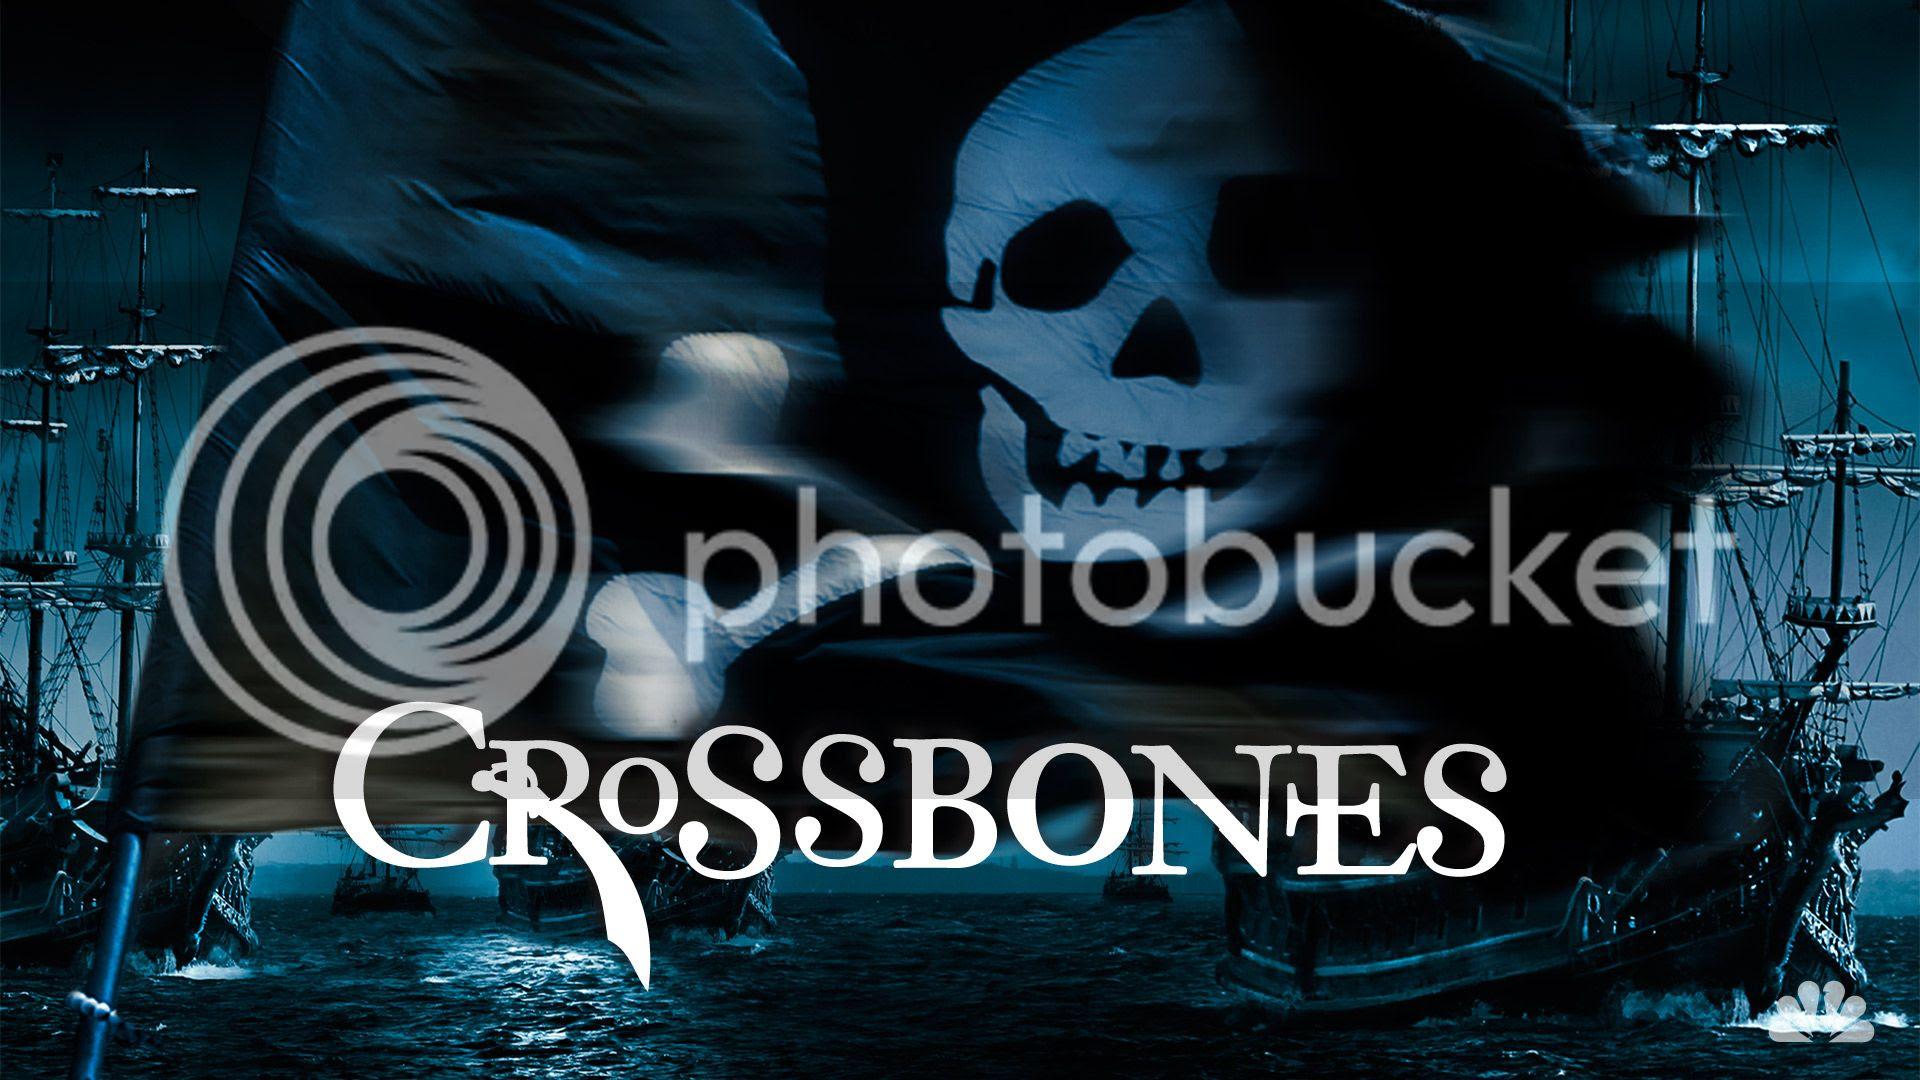 photo CrossbonesPromo_zps063dcdb2.jpg